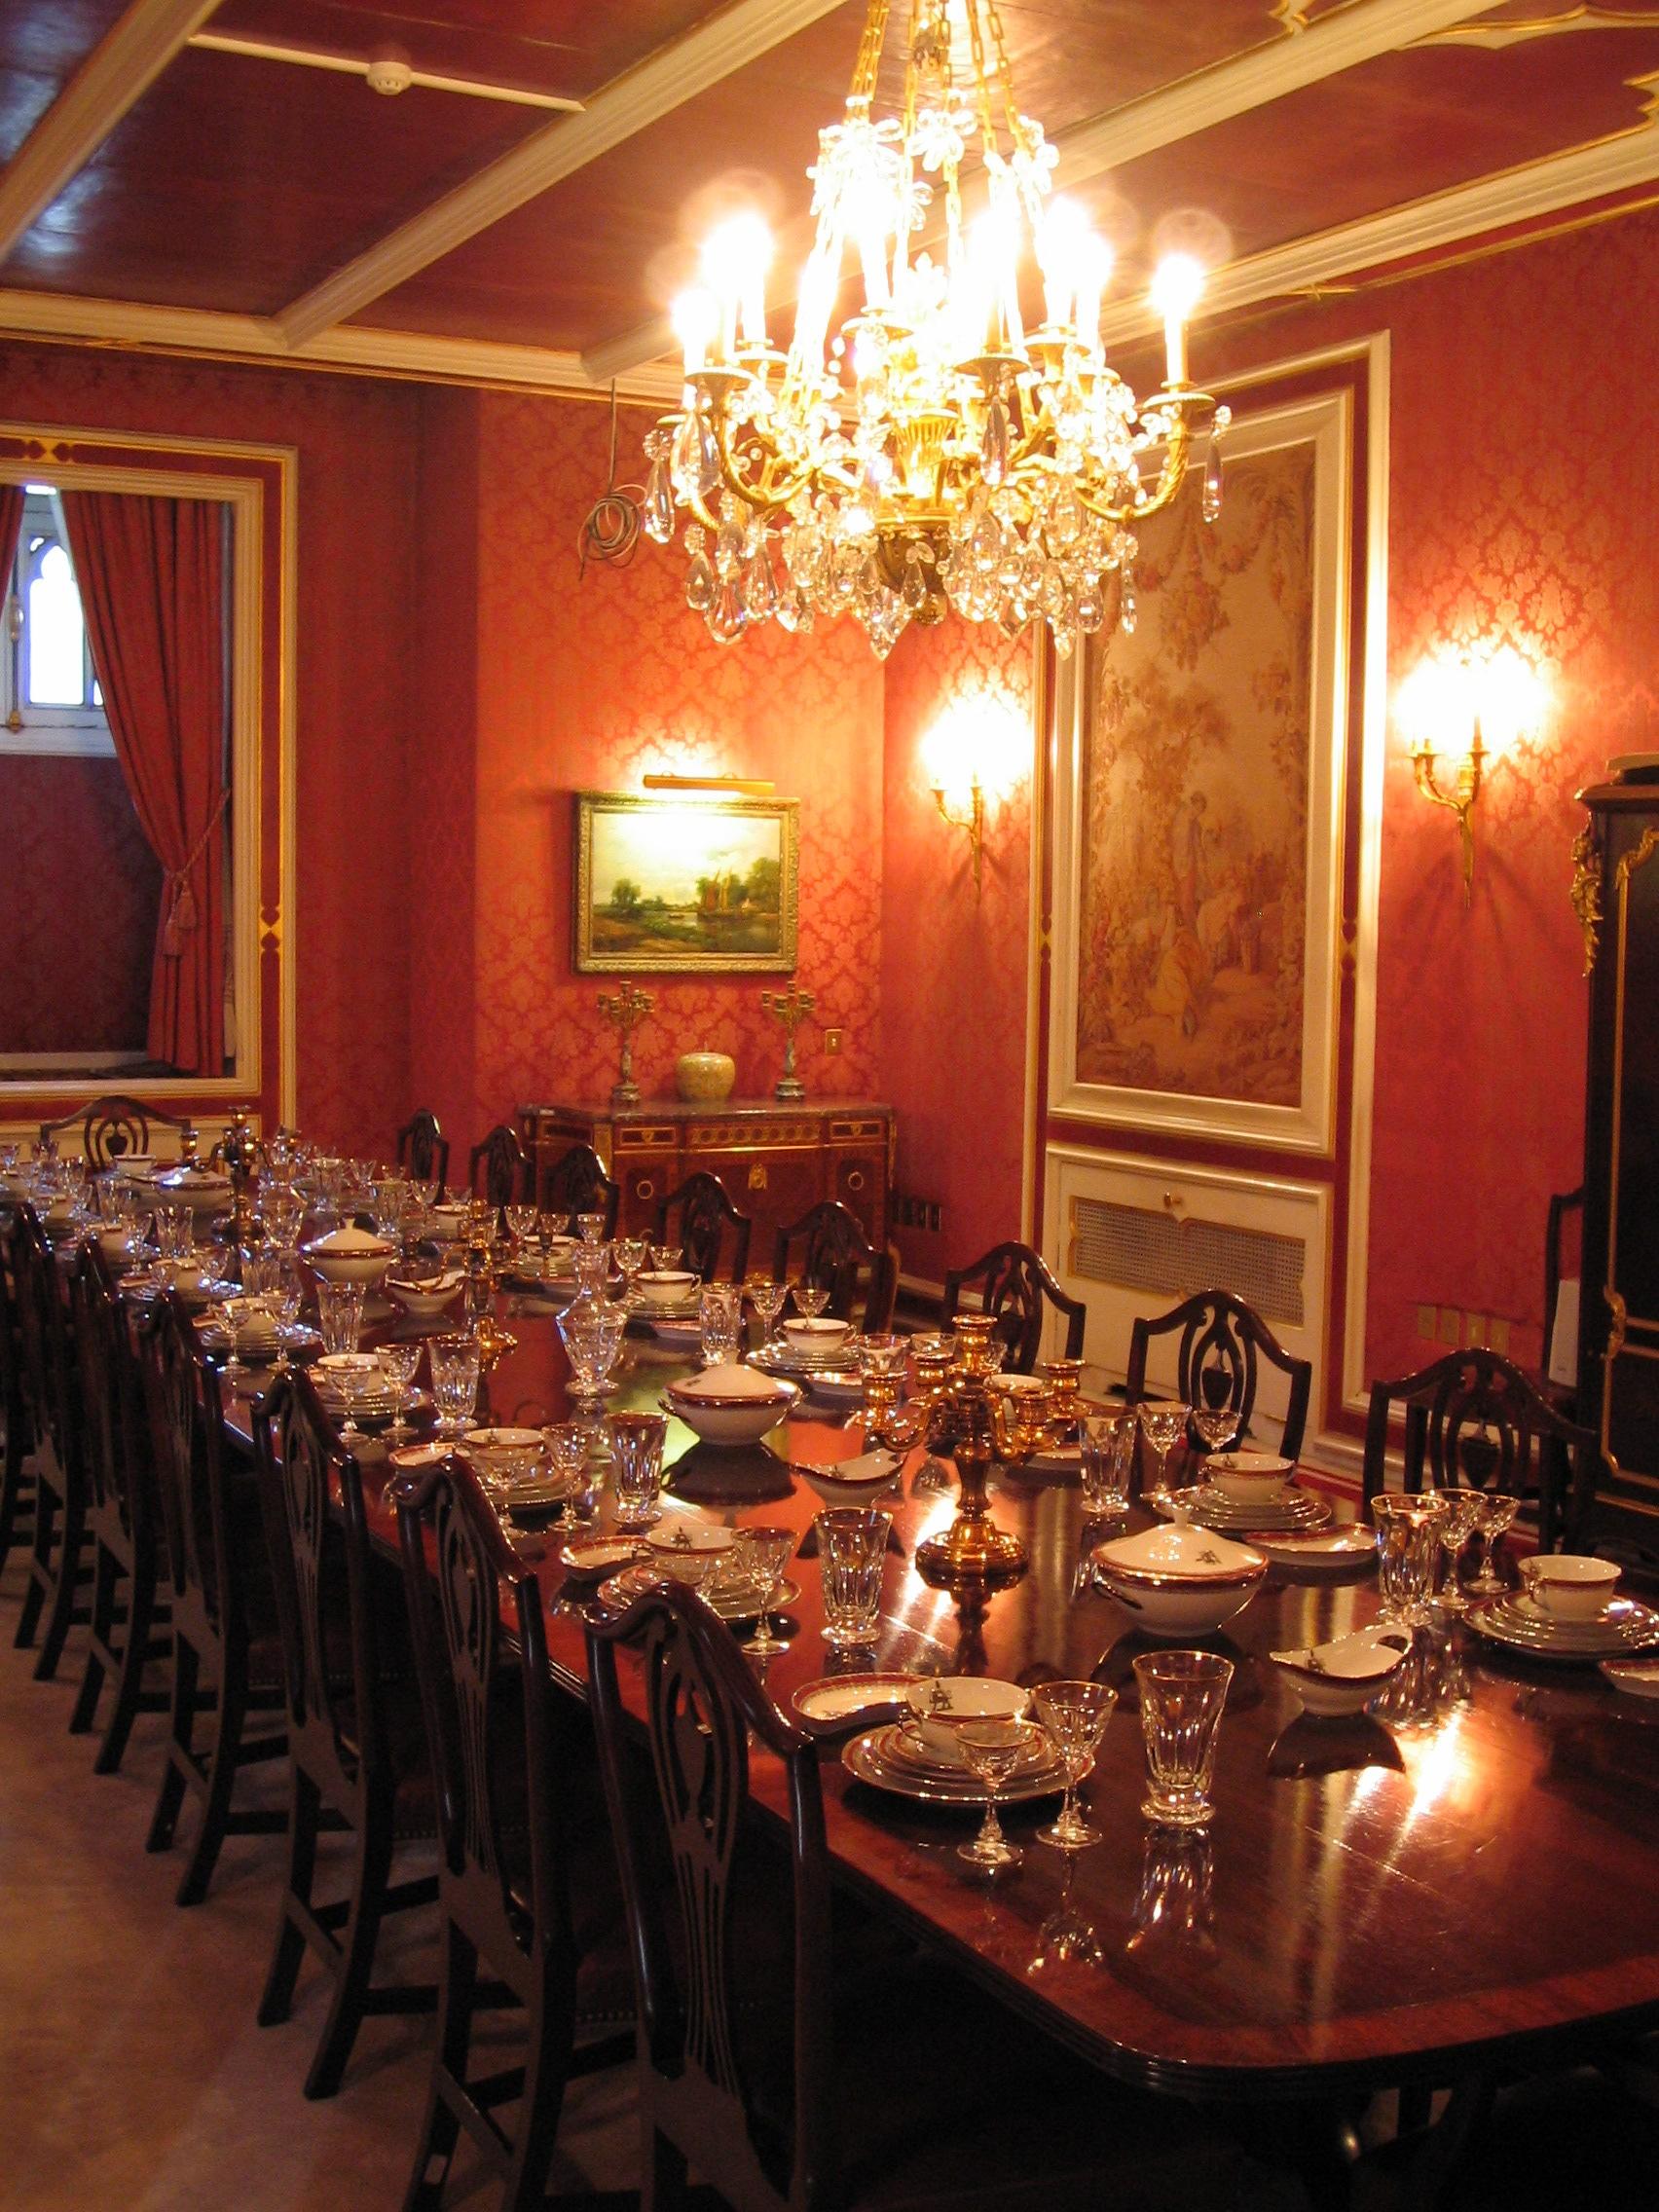 : Diningroom from dic.academic.ru size 1704 x 2272 jpeg 1088kB